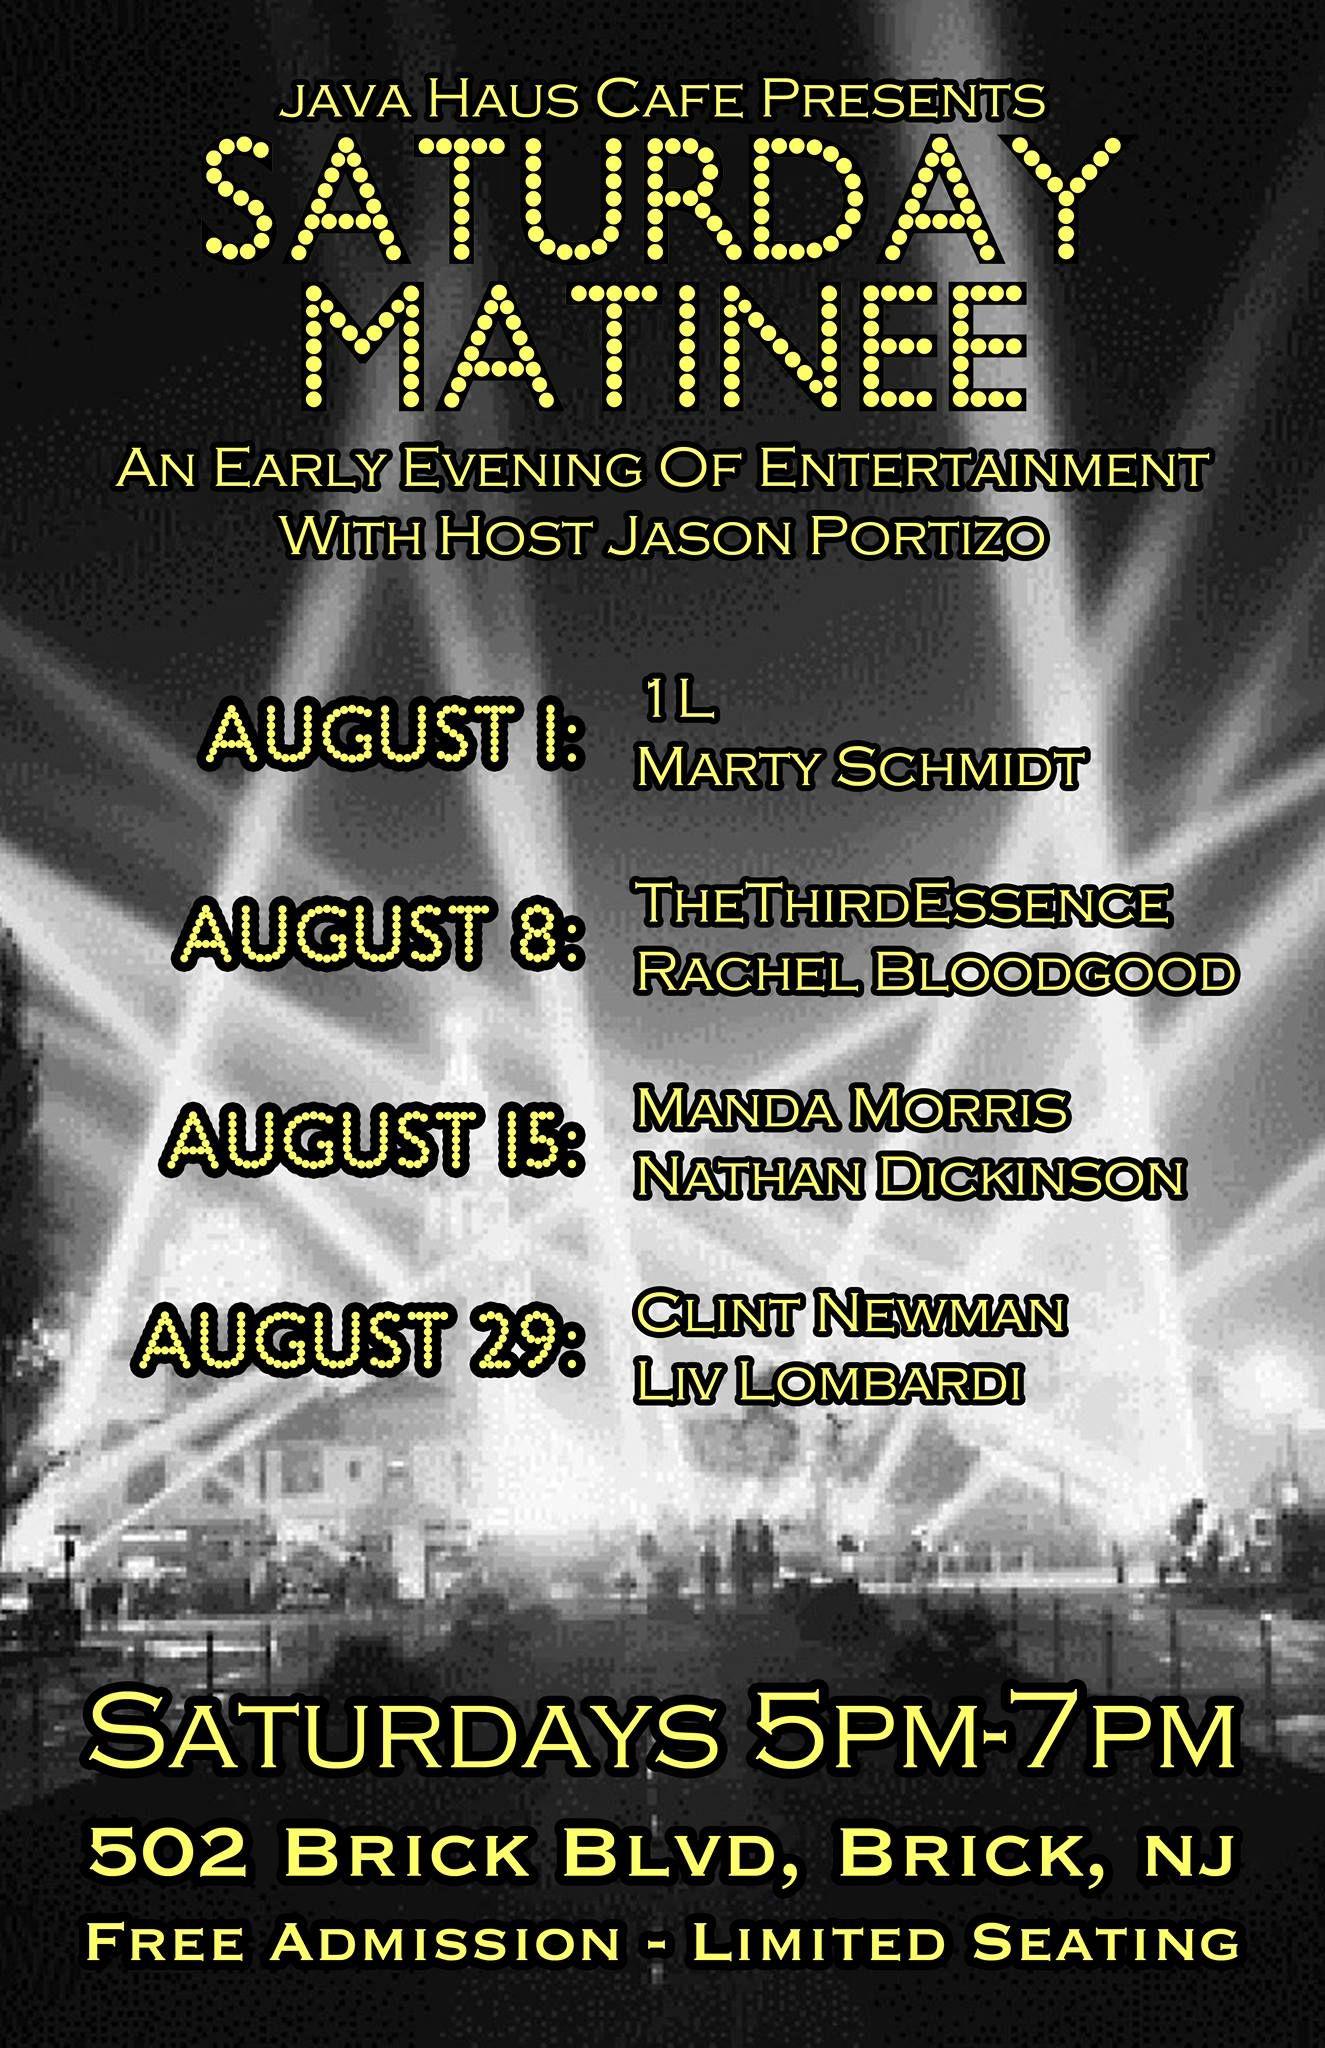 Saturday! August 29th #livemusic #localmusic #BrickNJ #concert  Java Haus Café 502 Brick Boulevard Brick, NJ 732-477-1100